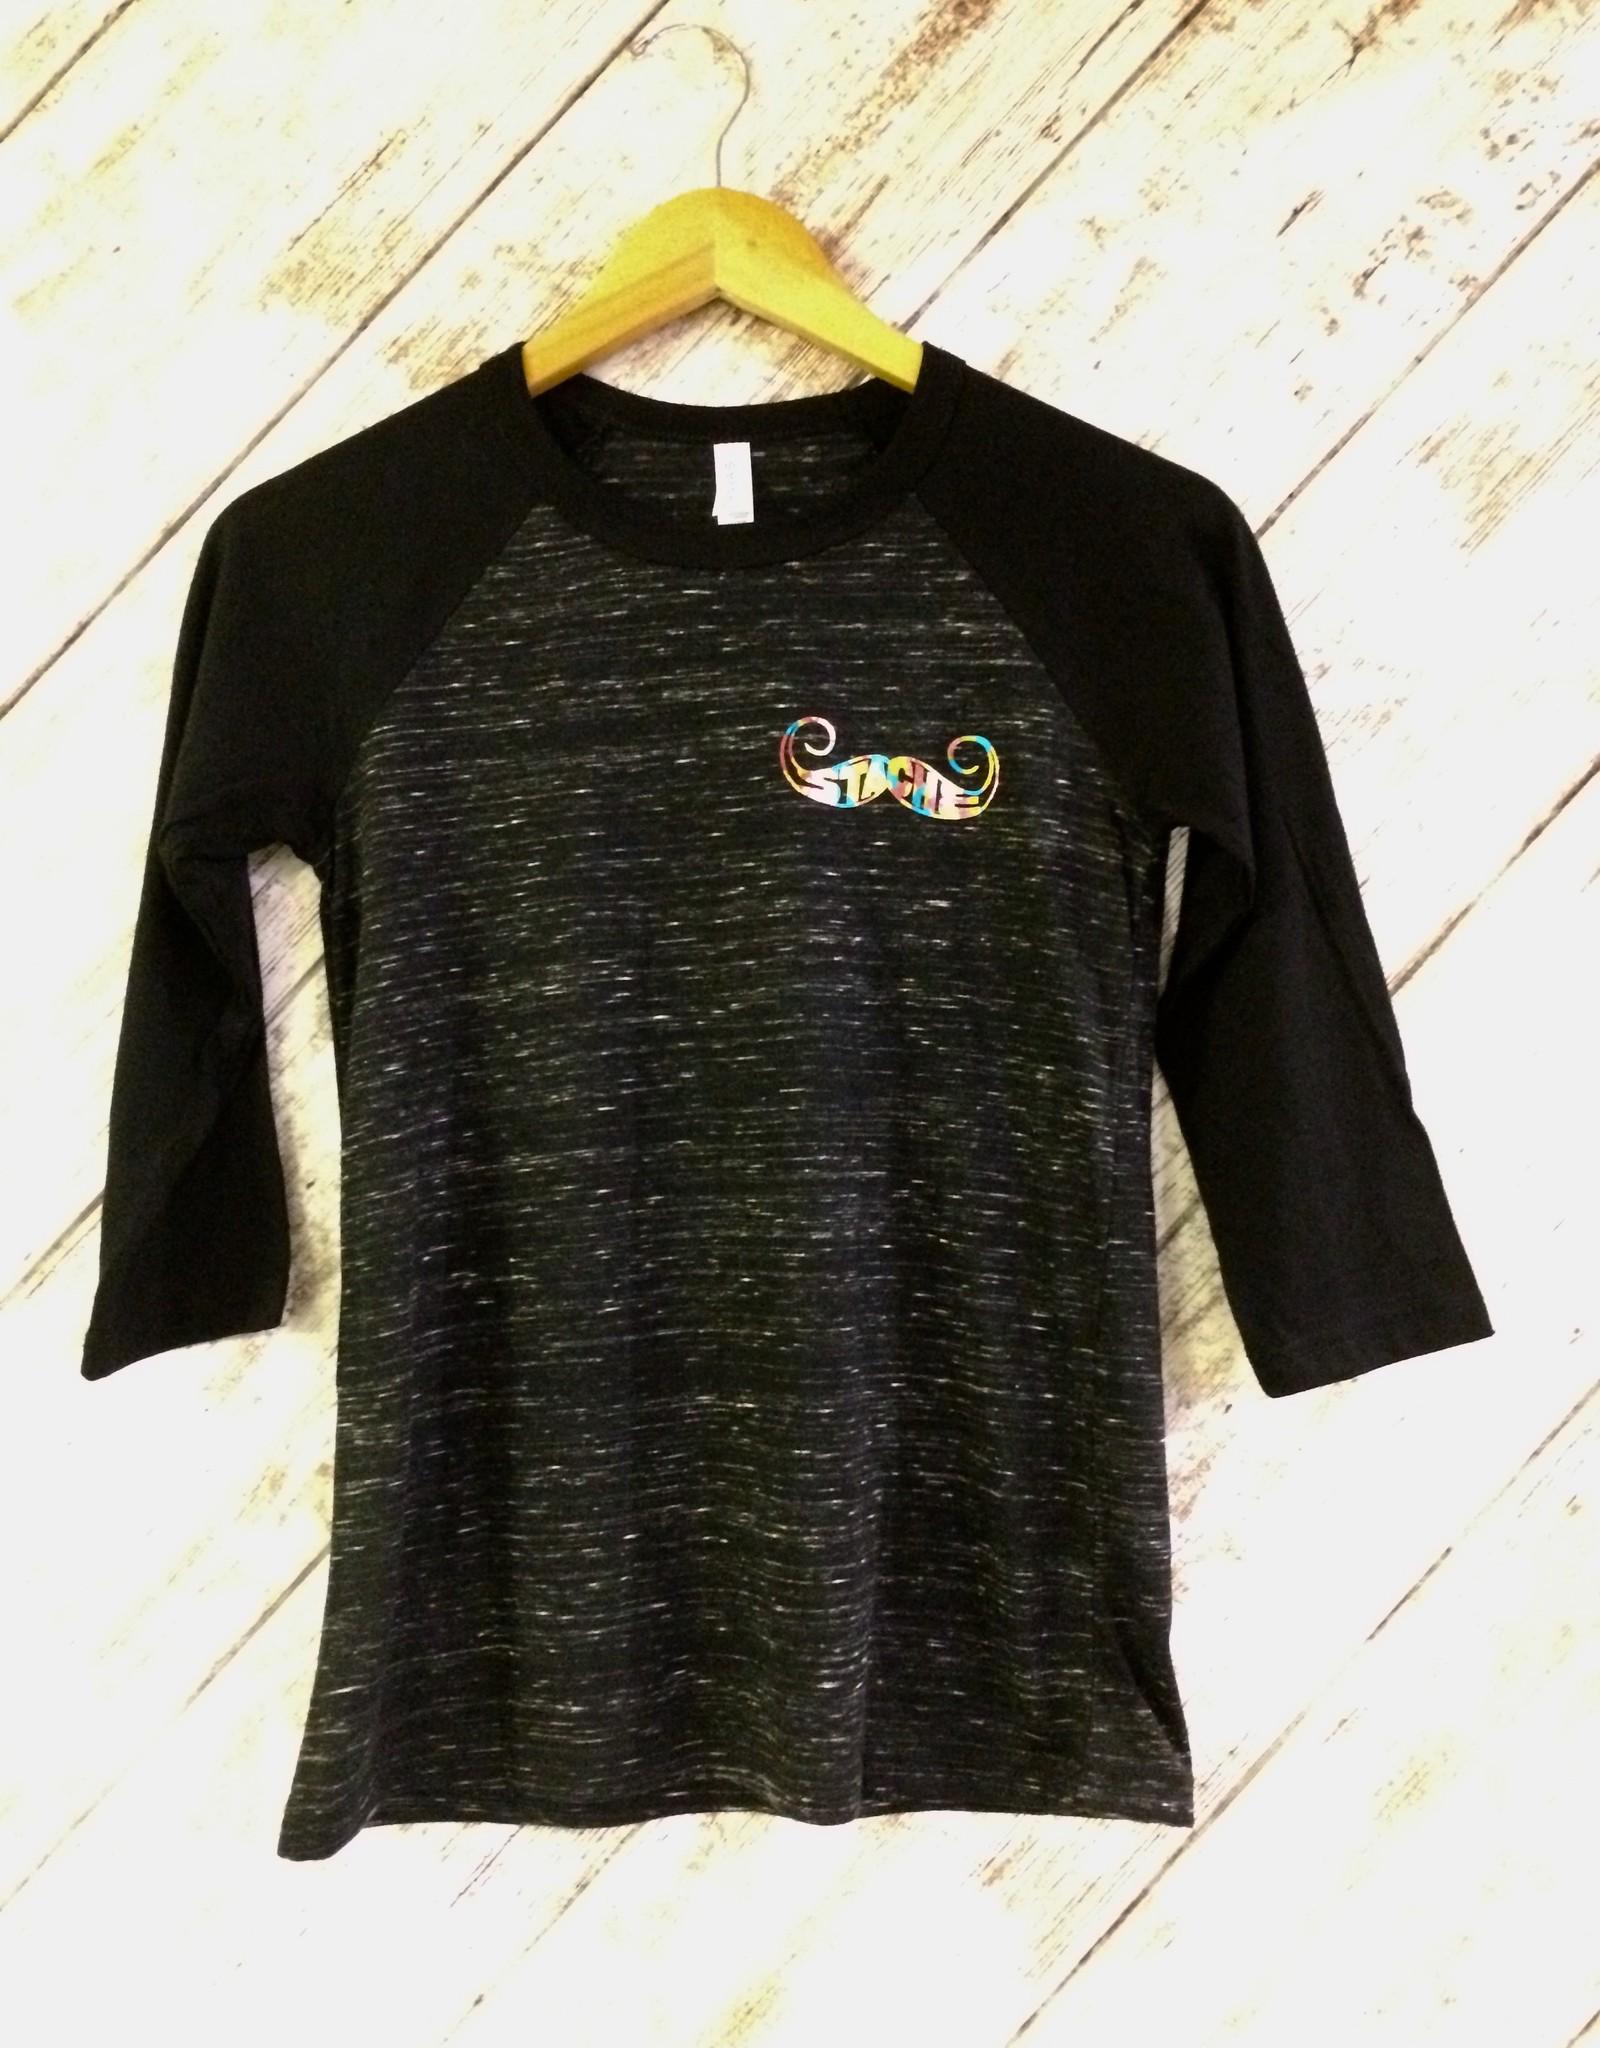 Stache 3/4 Sleve shirt